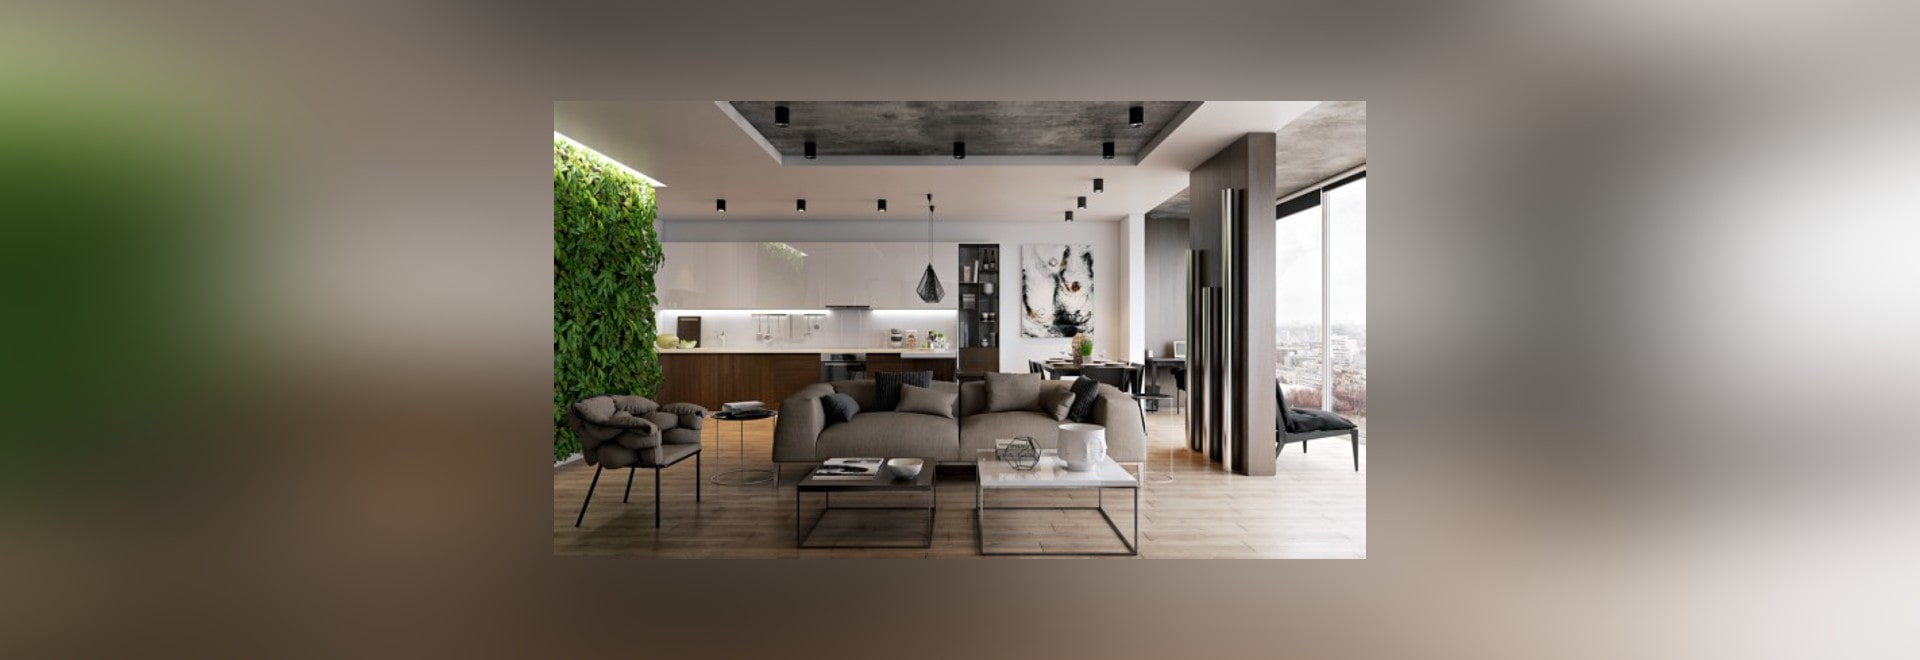 Bon Verdant Vertical Gardens Bring Beauty Indoors